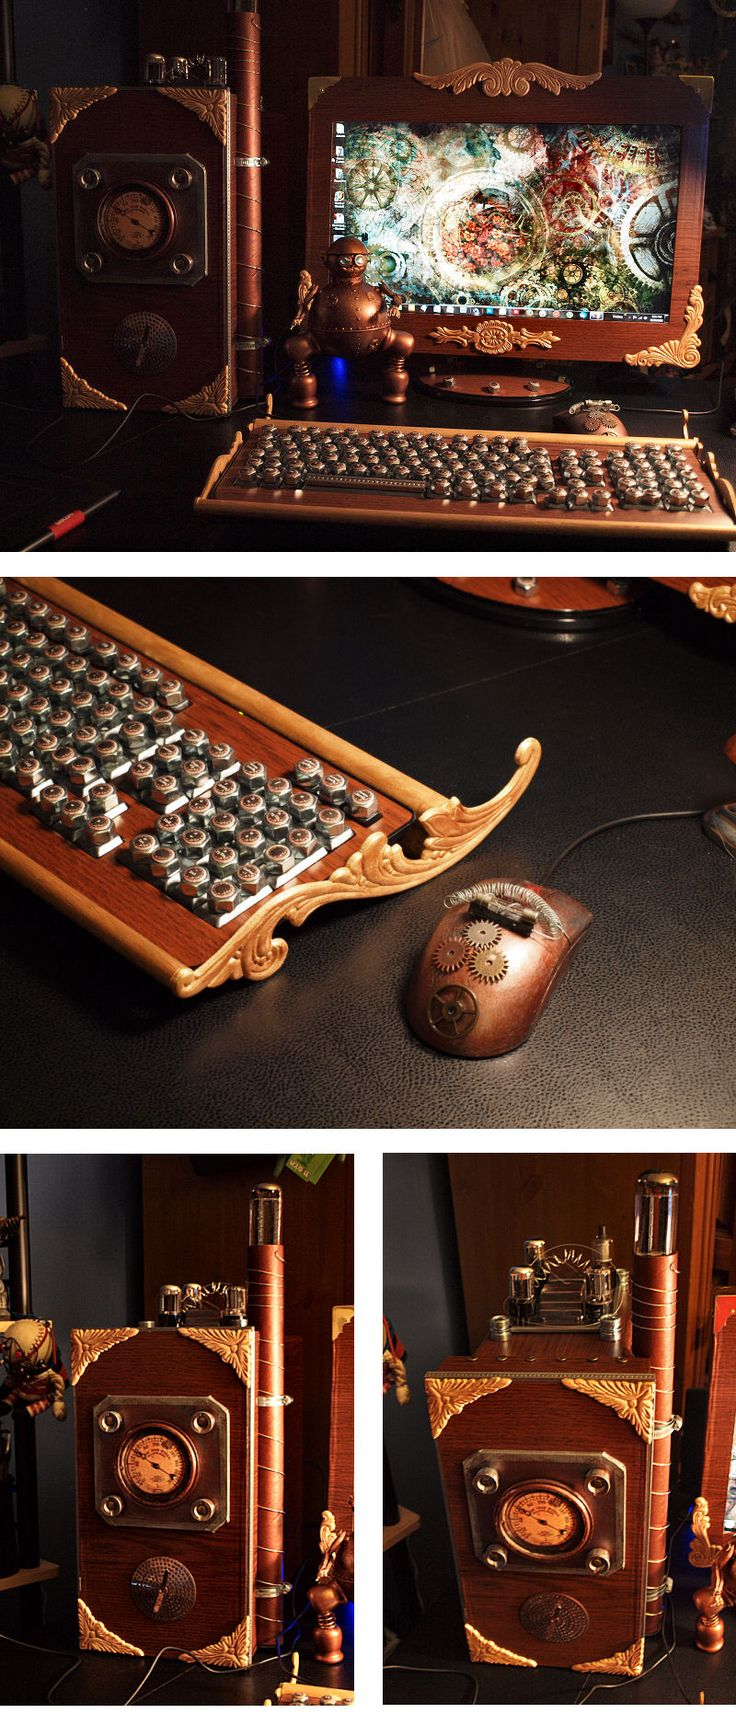 Steampunk Computer Mod by ajldesign.deviantart.com on @deviantART